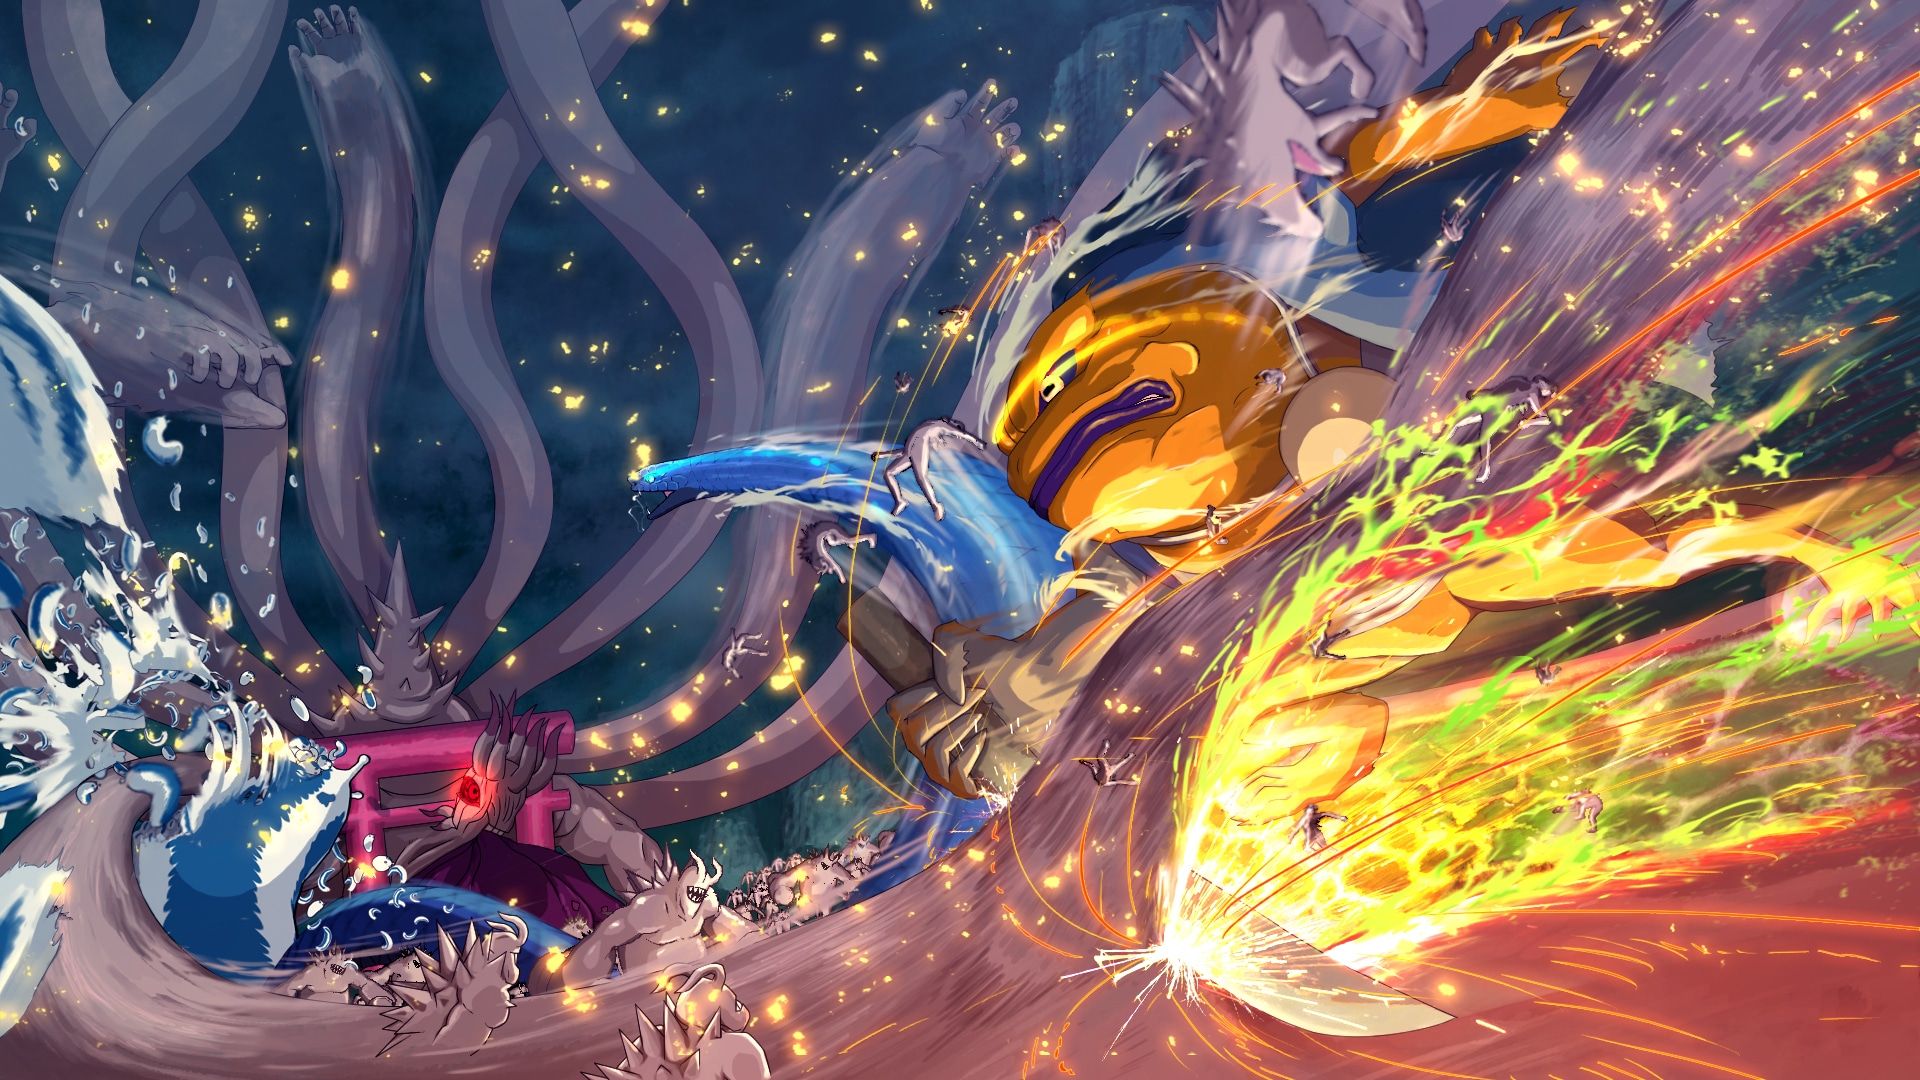 1426667094-naruto-shippuden-ultimate-ninja-storm-4-boss-battle-artwork[1]